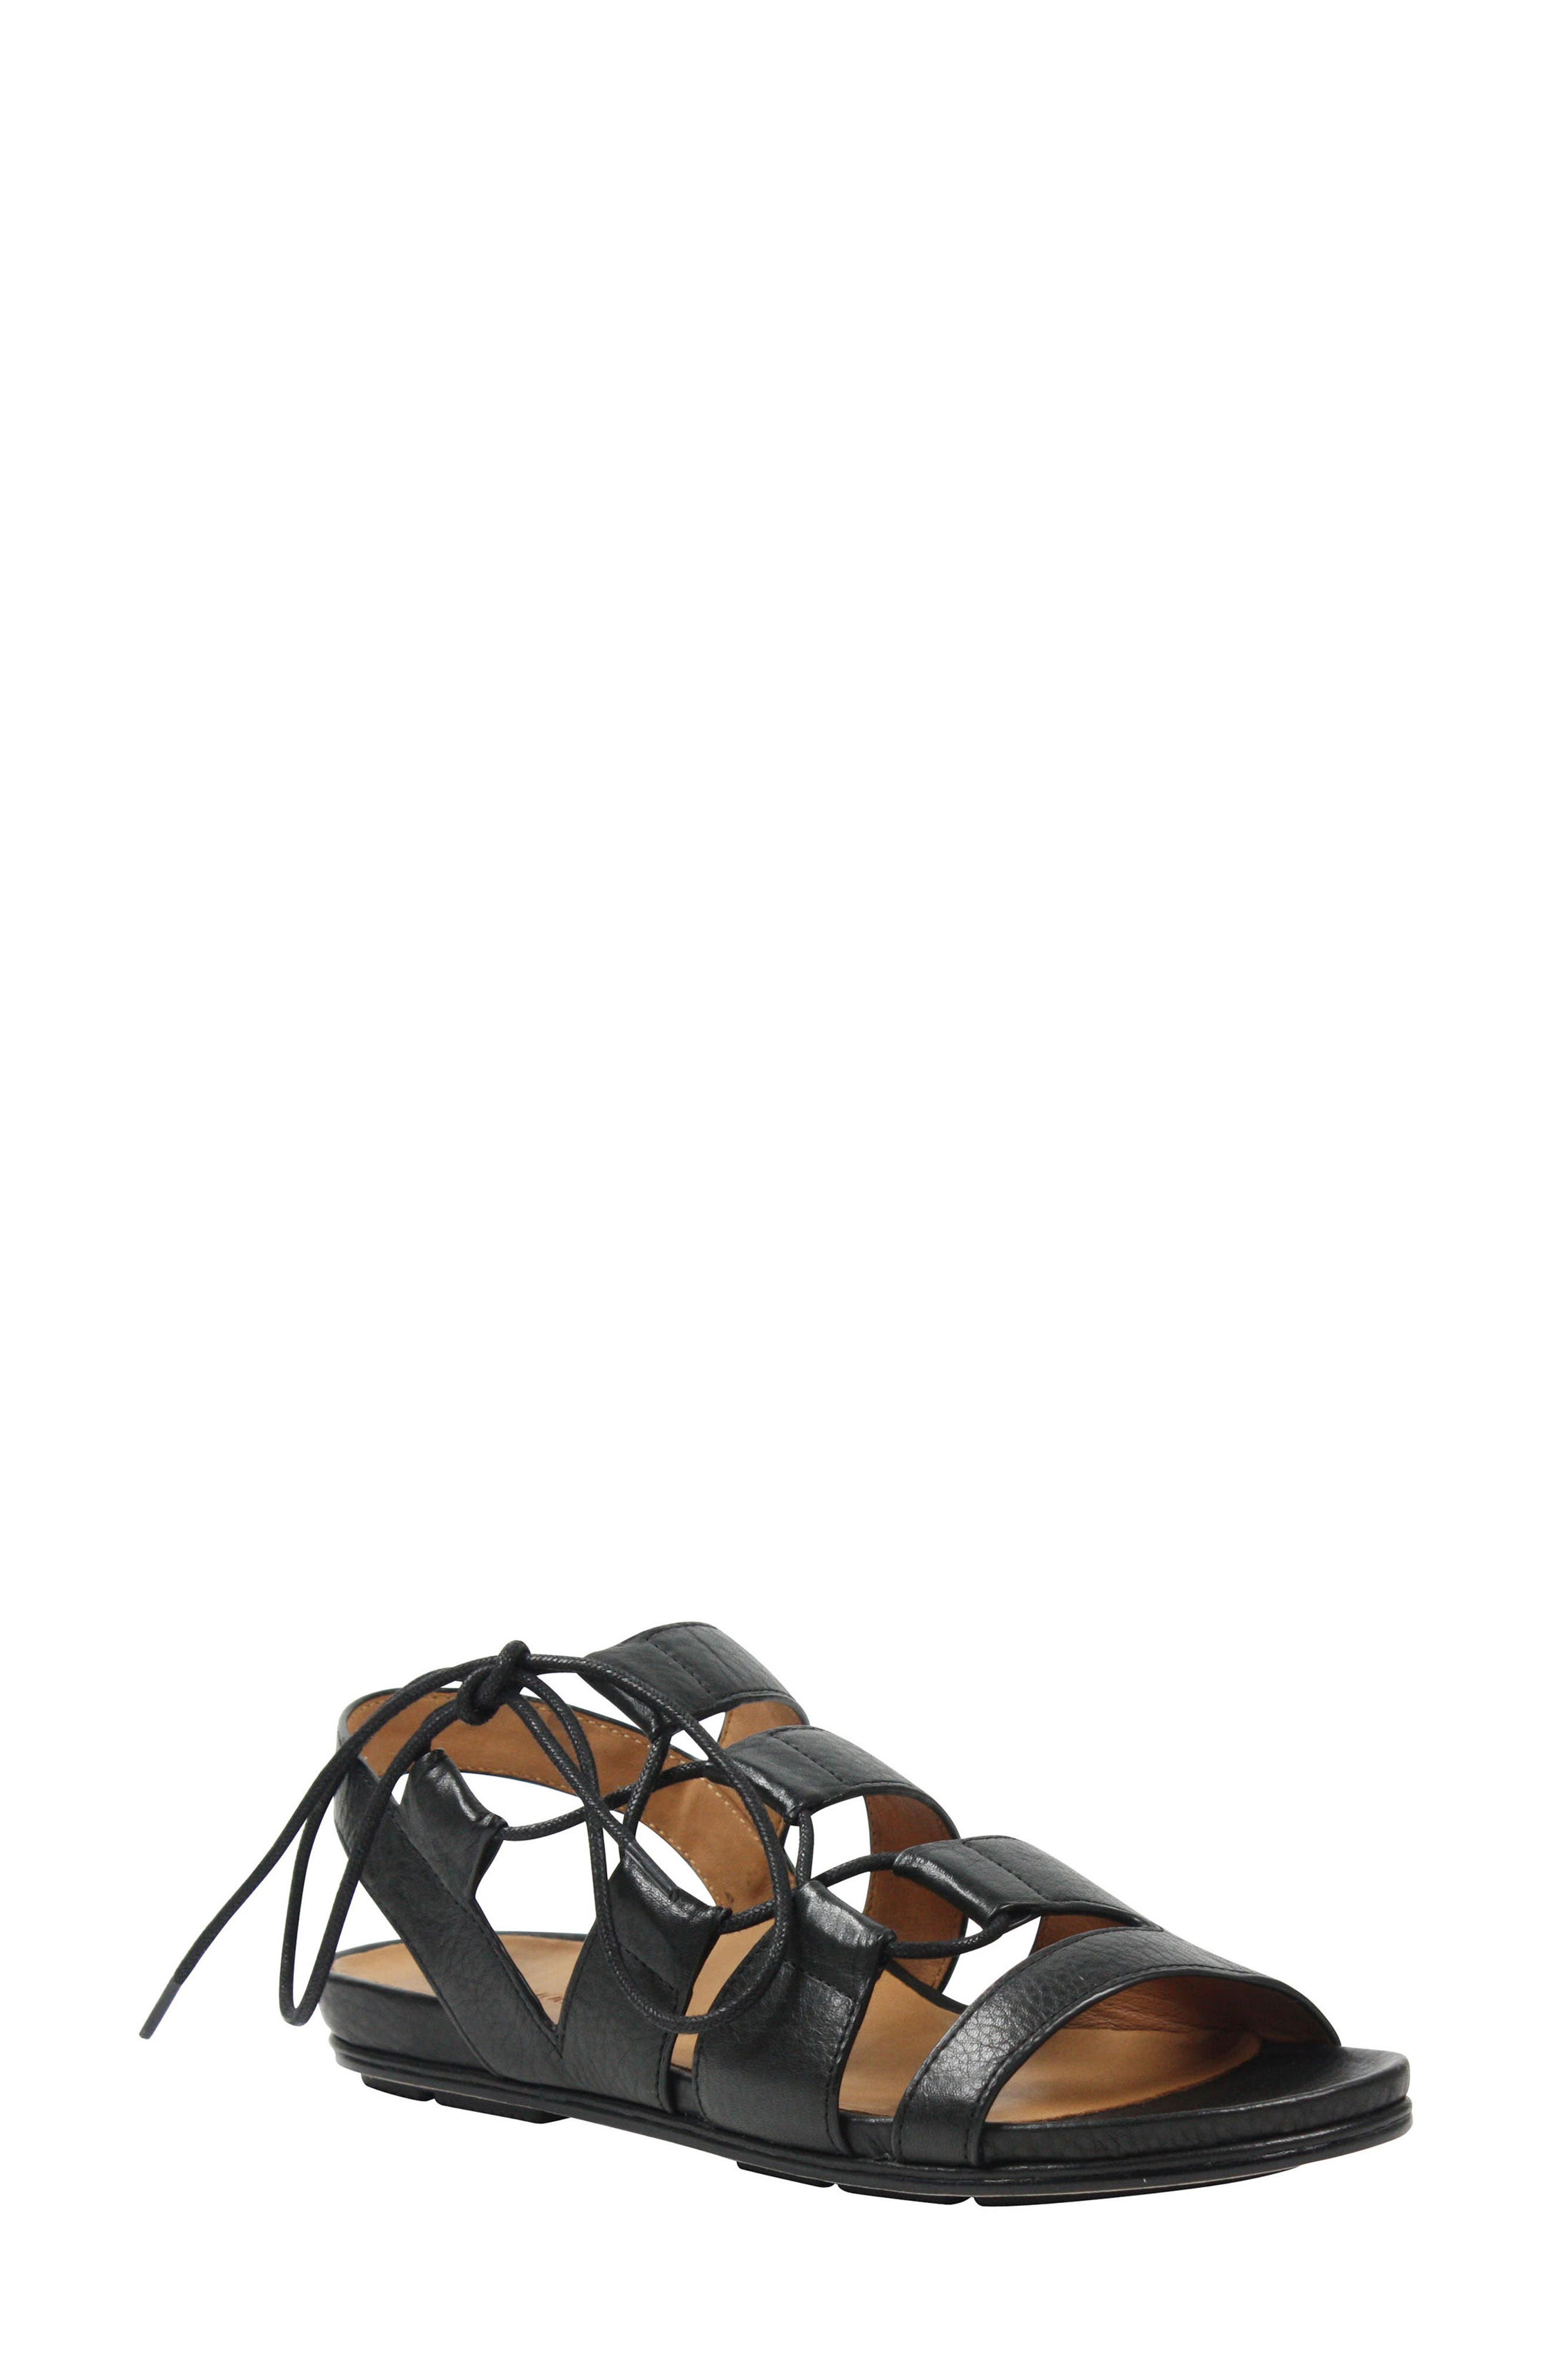 Digbee Sandal,                             Main thumbnail 1, color,                             Black Leather